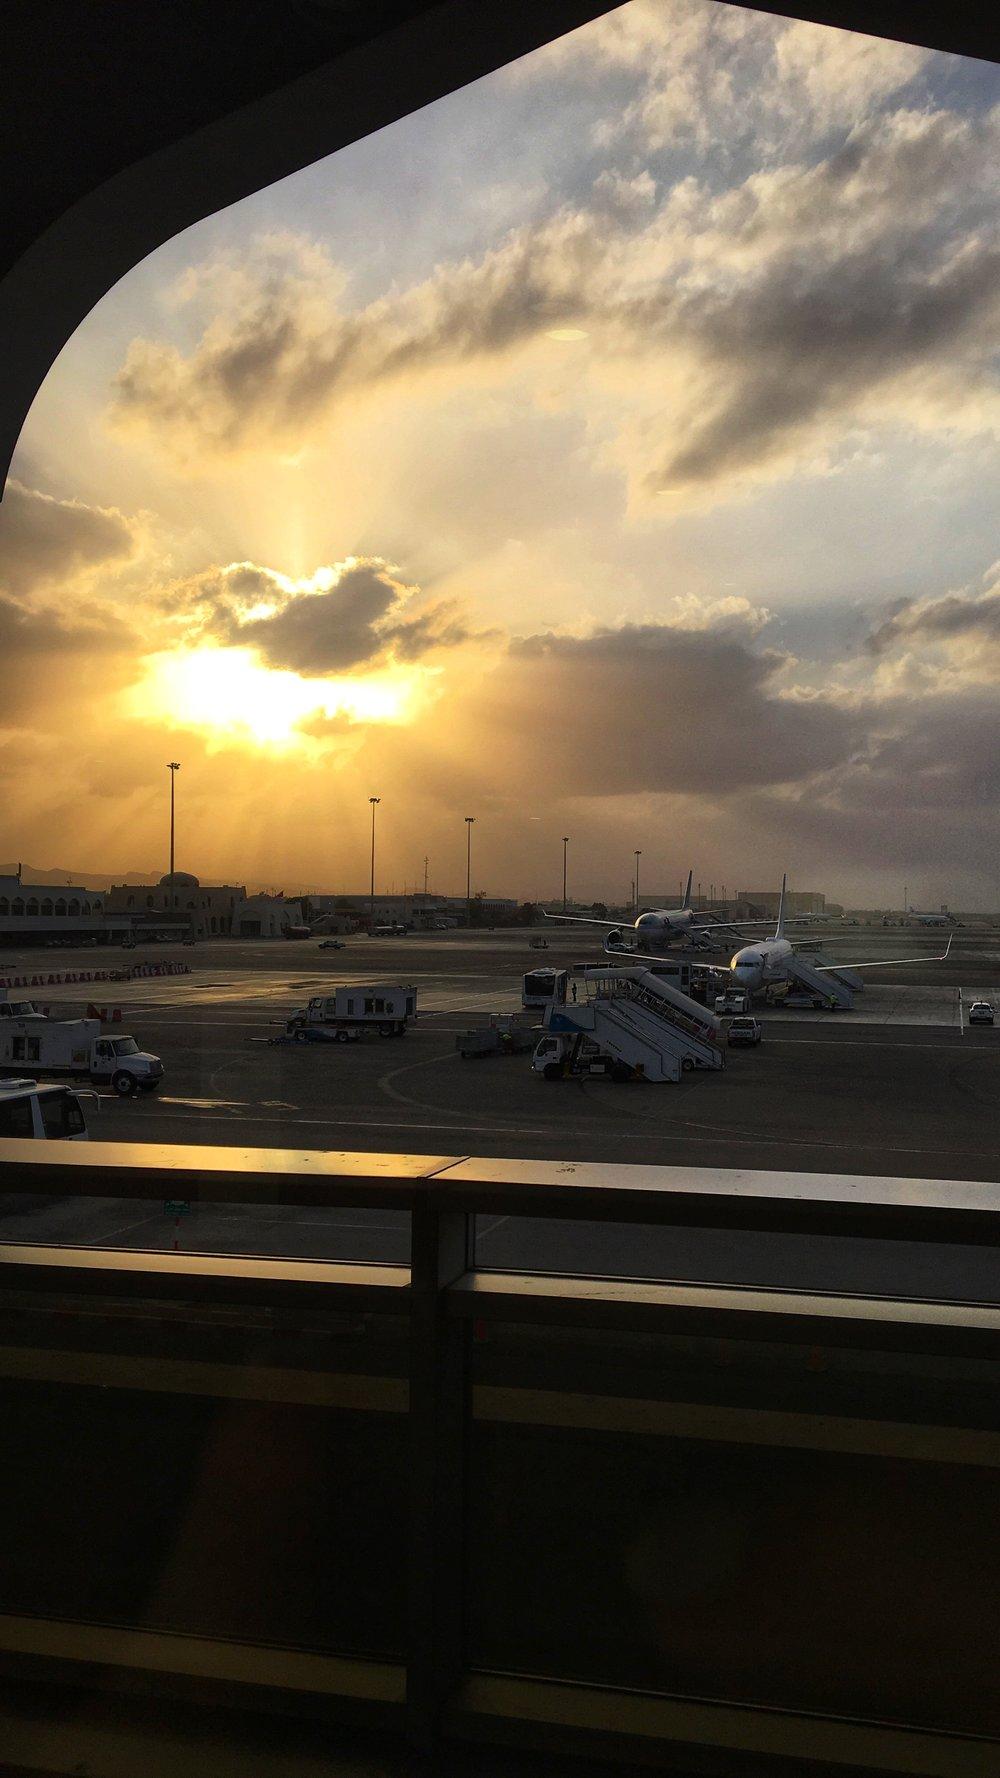 - Muscat International Airport